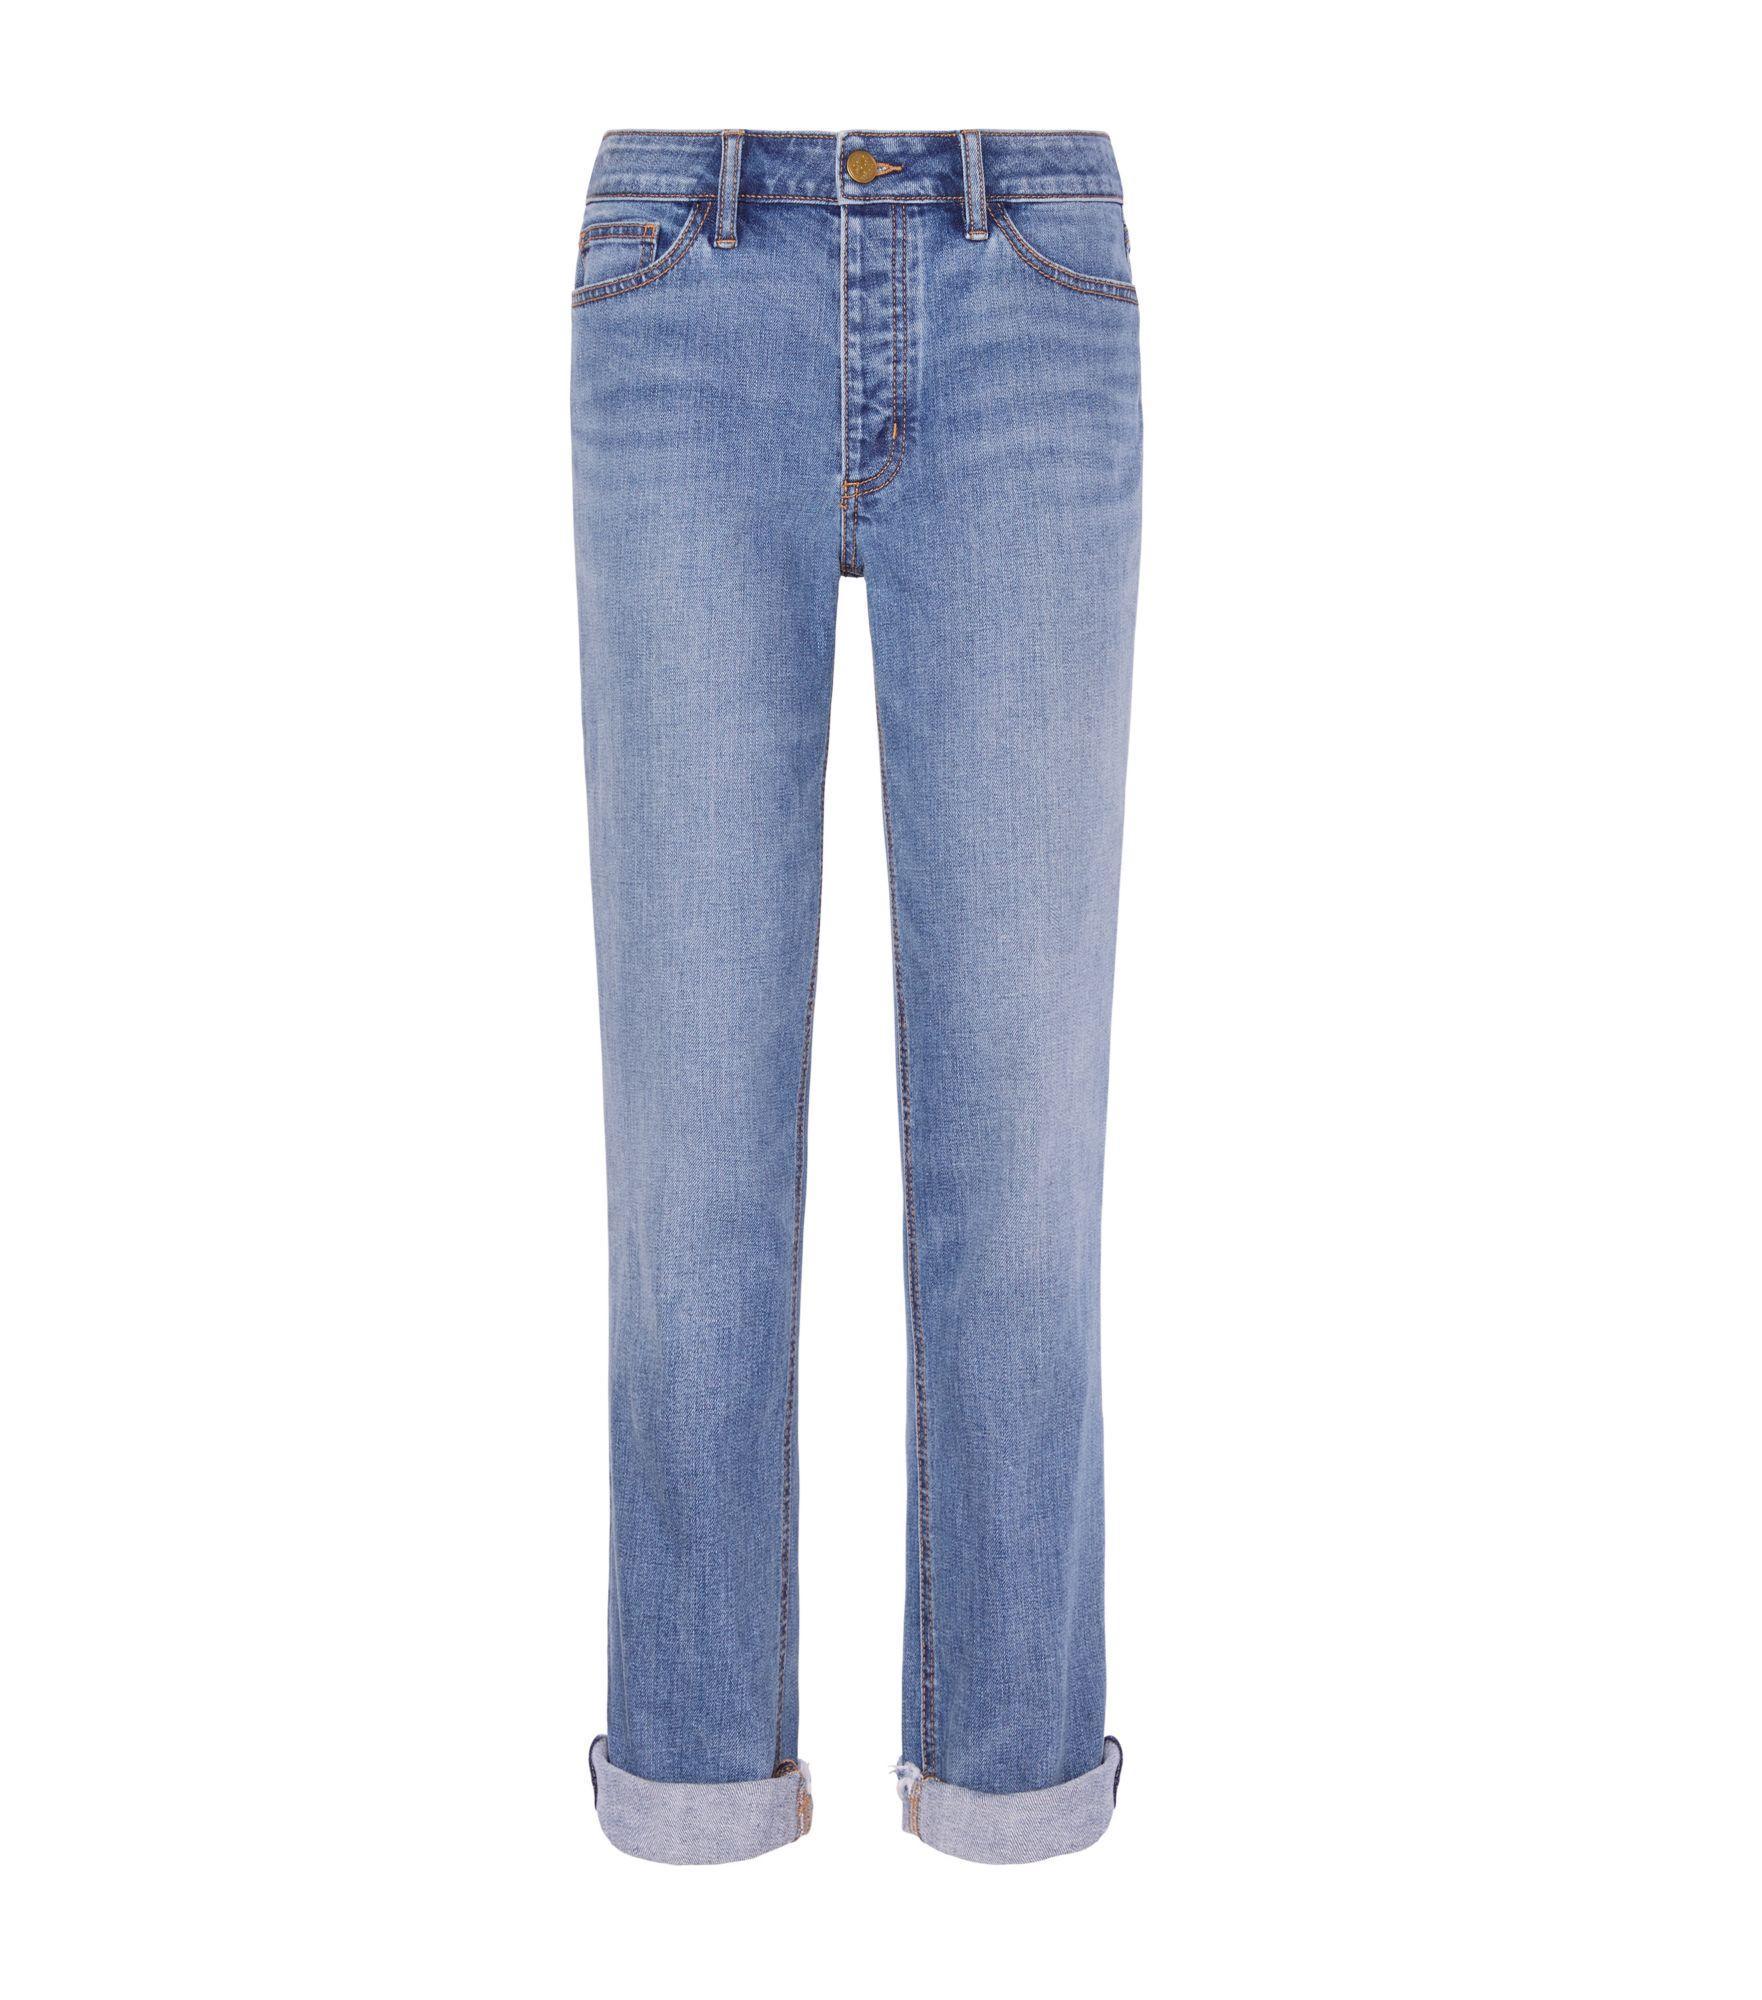 Tory Burch Serena Slouchy Straight-leg Jean In Dusk Blue Wash